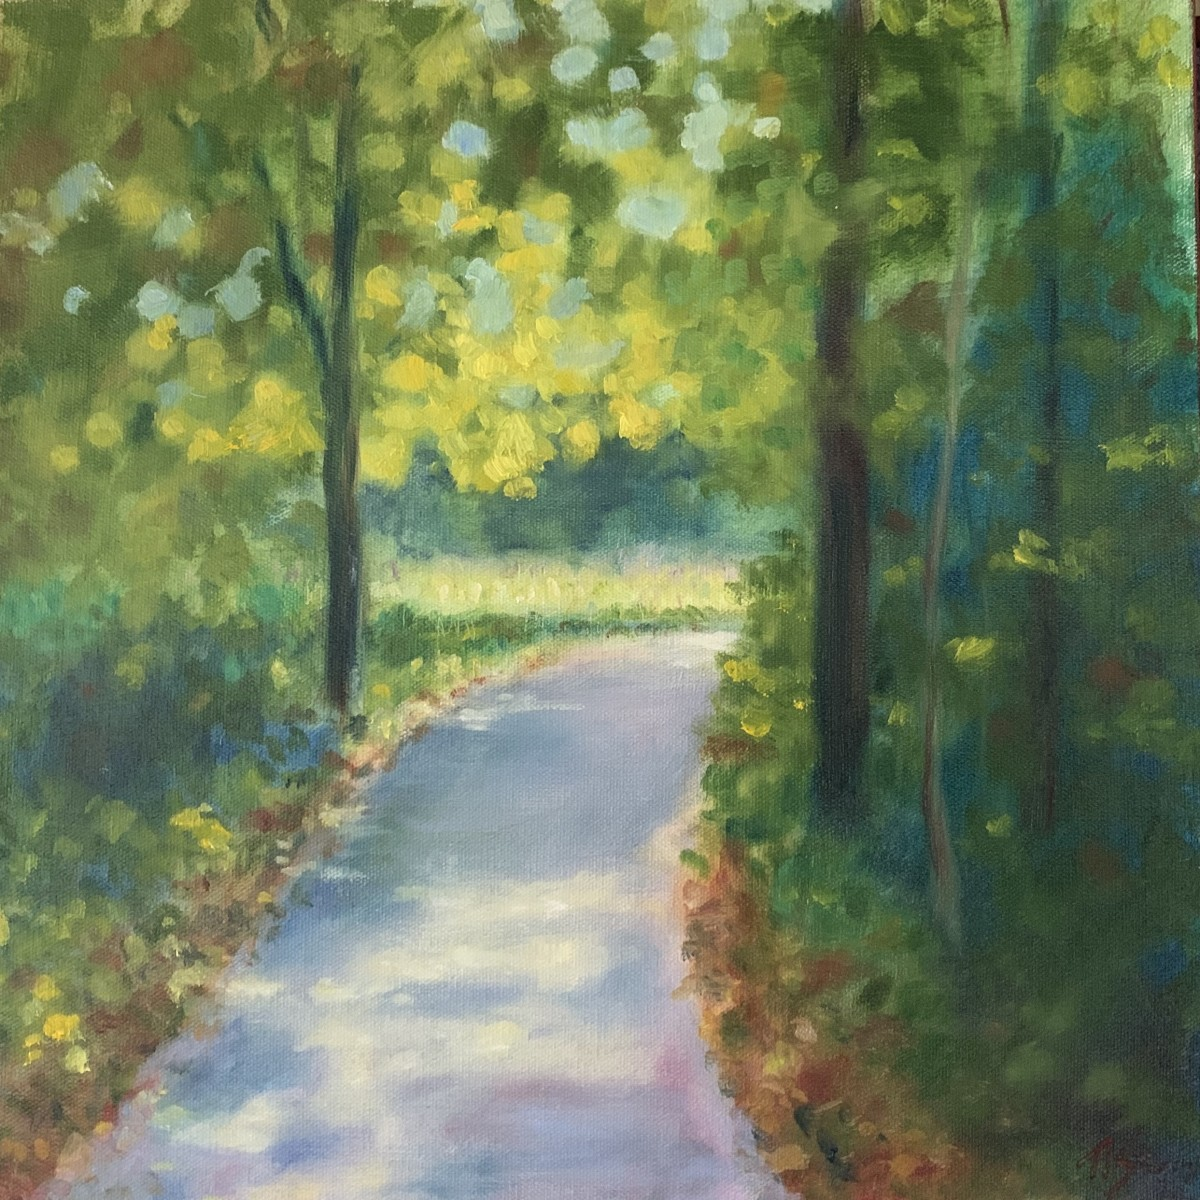 Riverwalk Tree - 36.07142N  79.09367W by Thomas Stevens